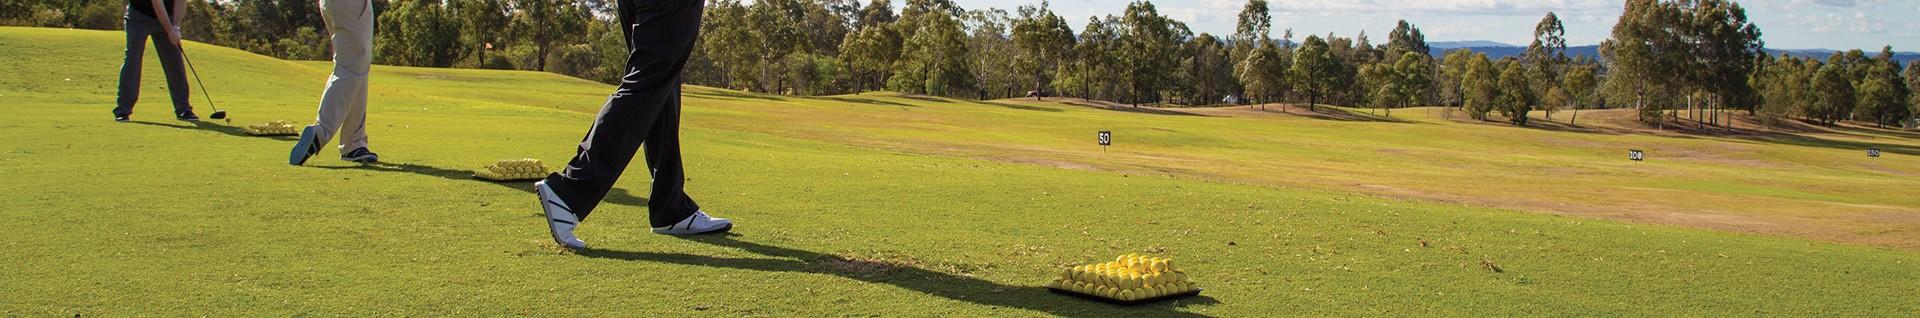 driving-range-practice-11